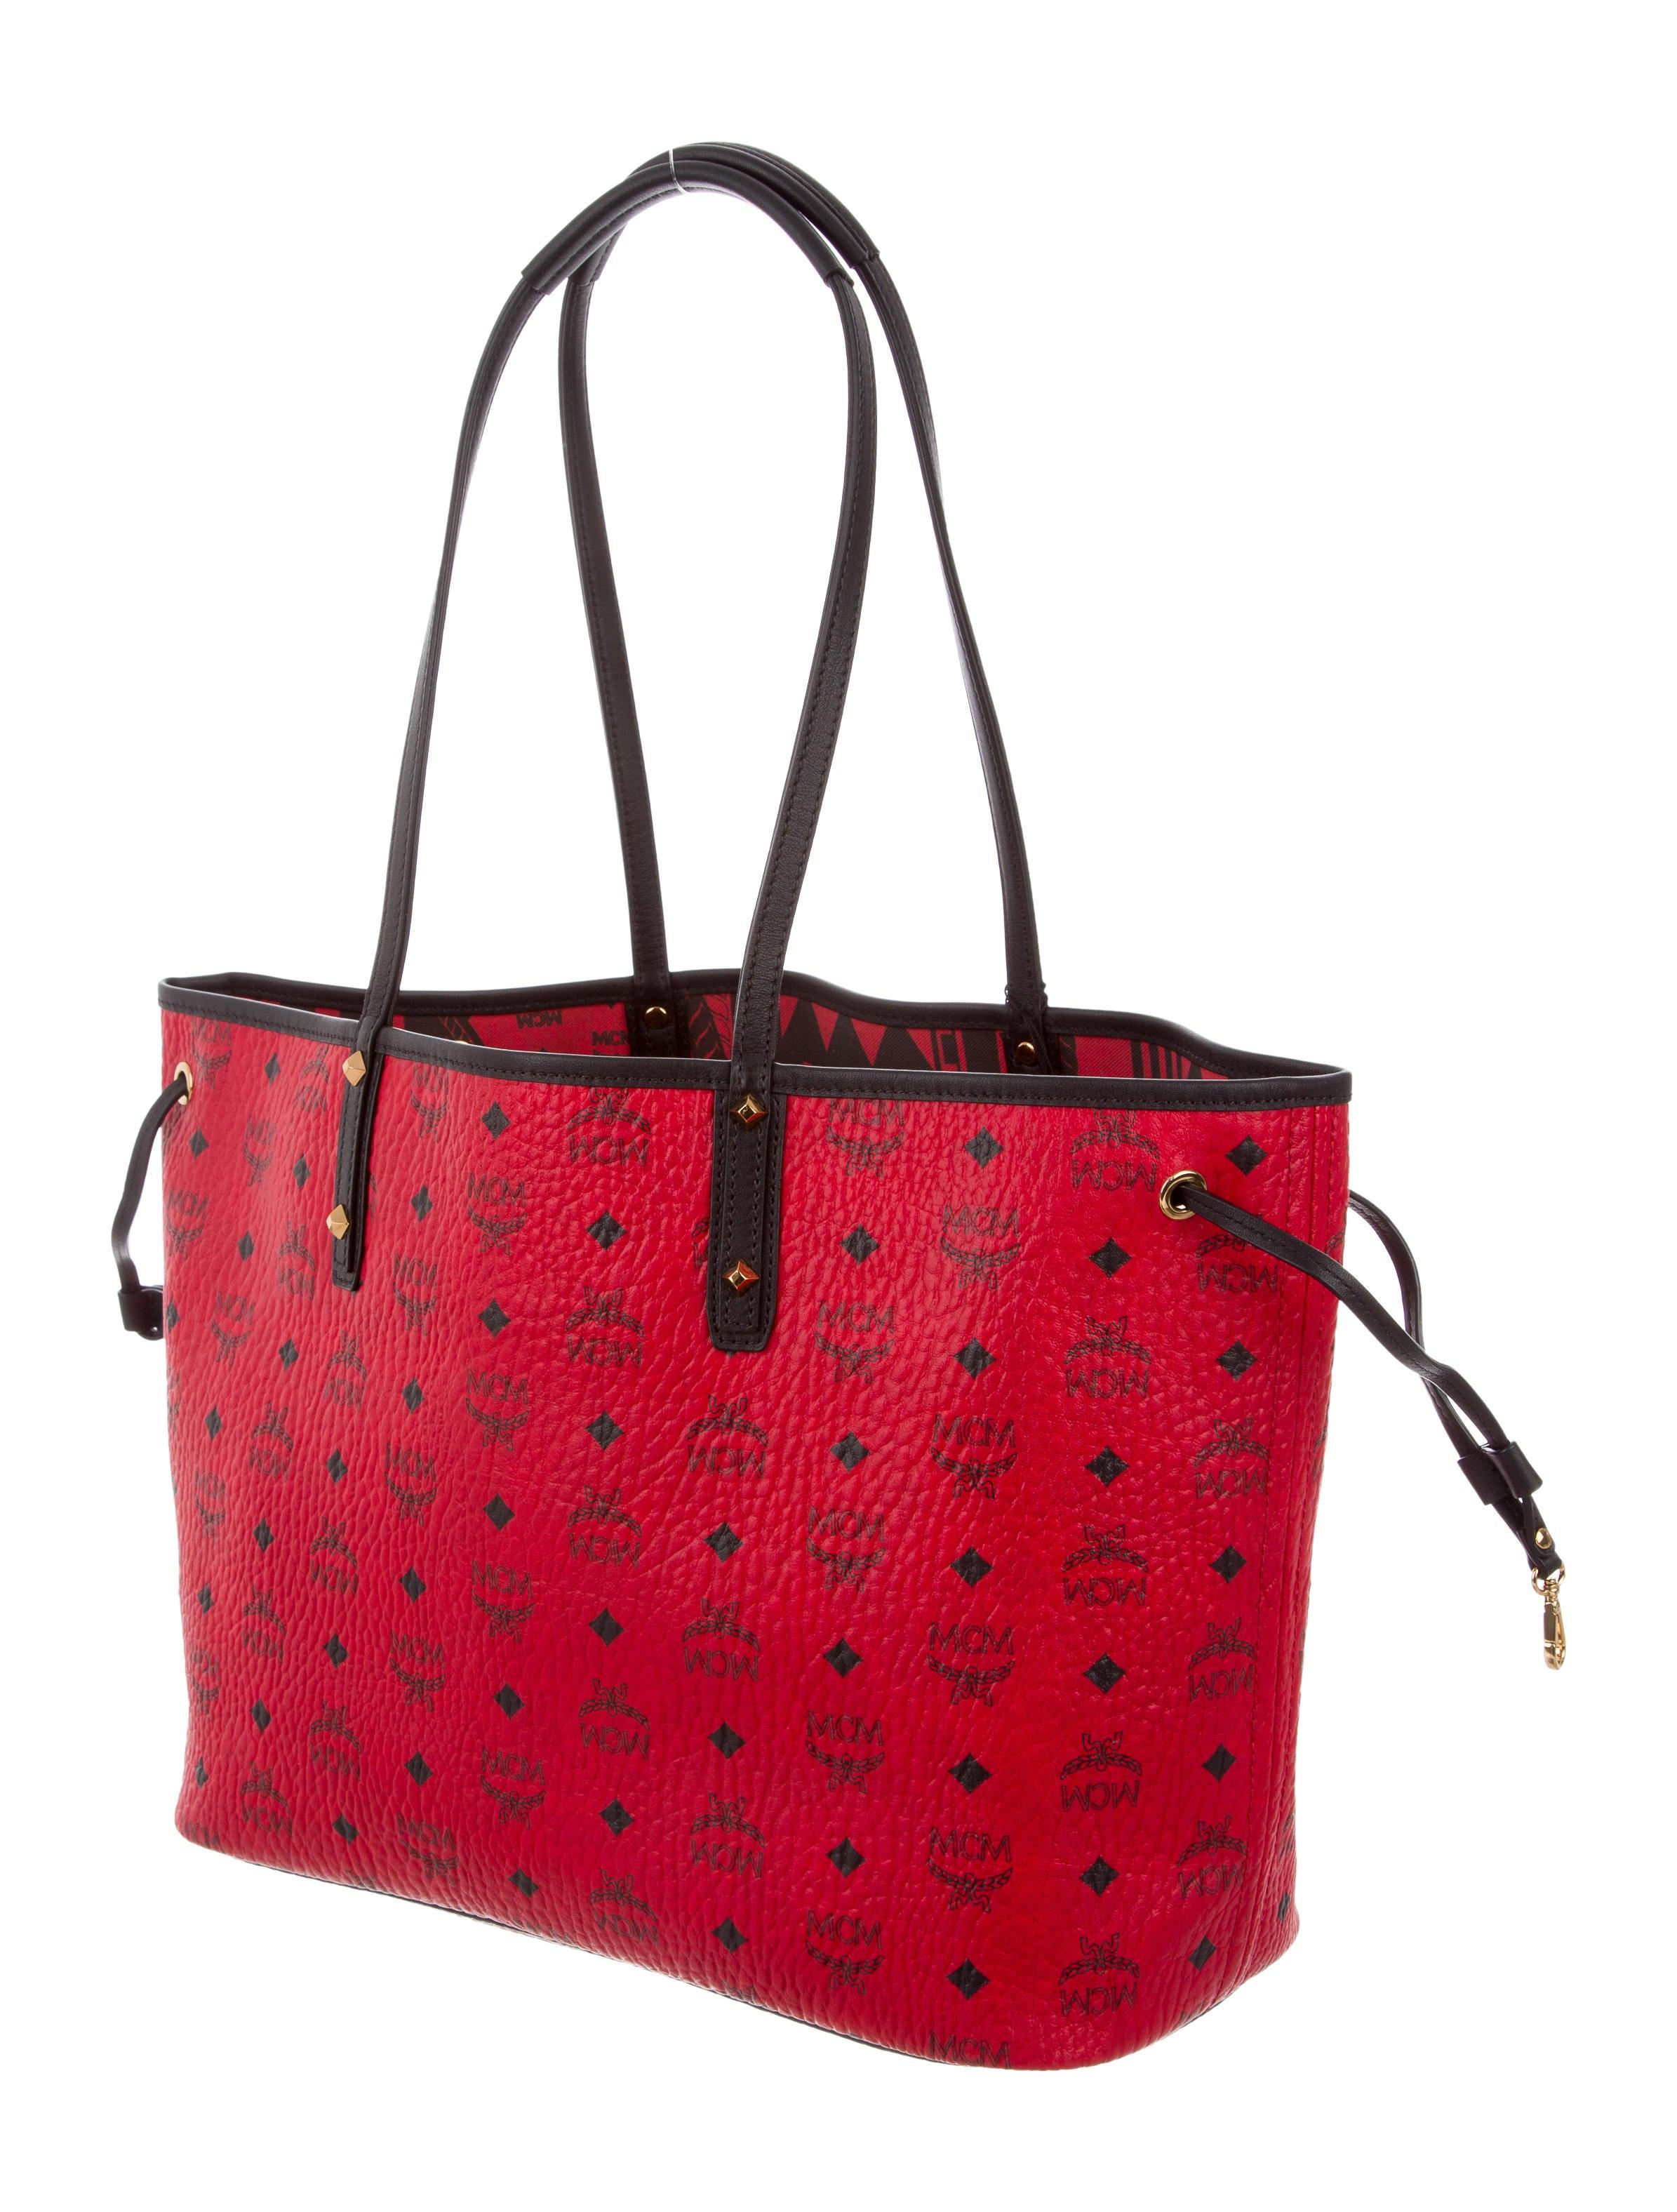 mcm medium reversible shopper tote handbags w3022020. Black Bedroom Furniture Sets. Home Design Ideas